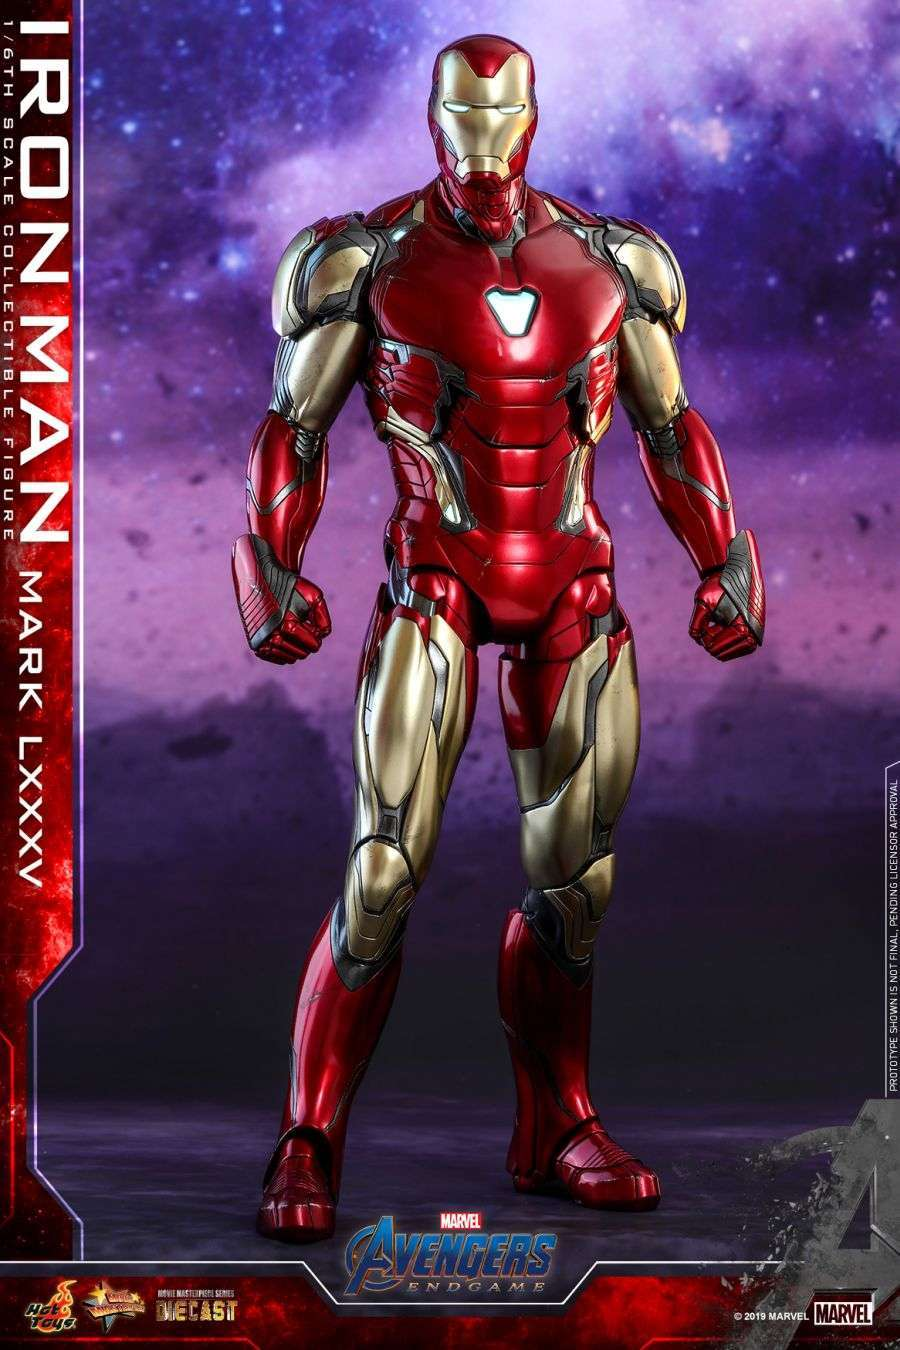 Hot Toys - Avengers 4 - Iron Man Mark LXXXV collectible figure_PR2